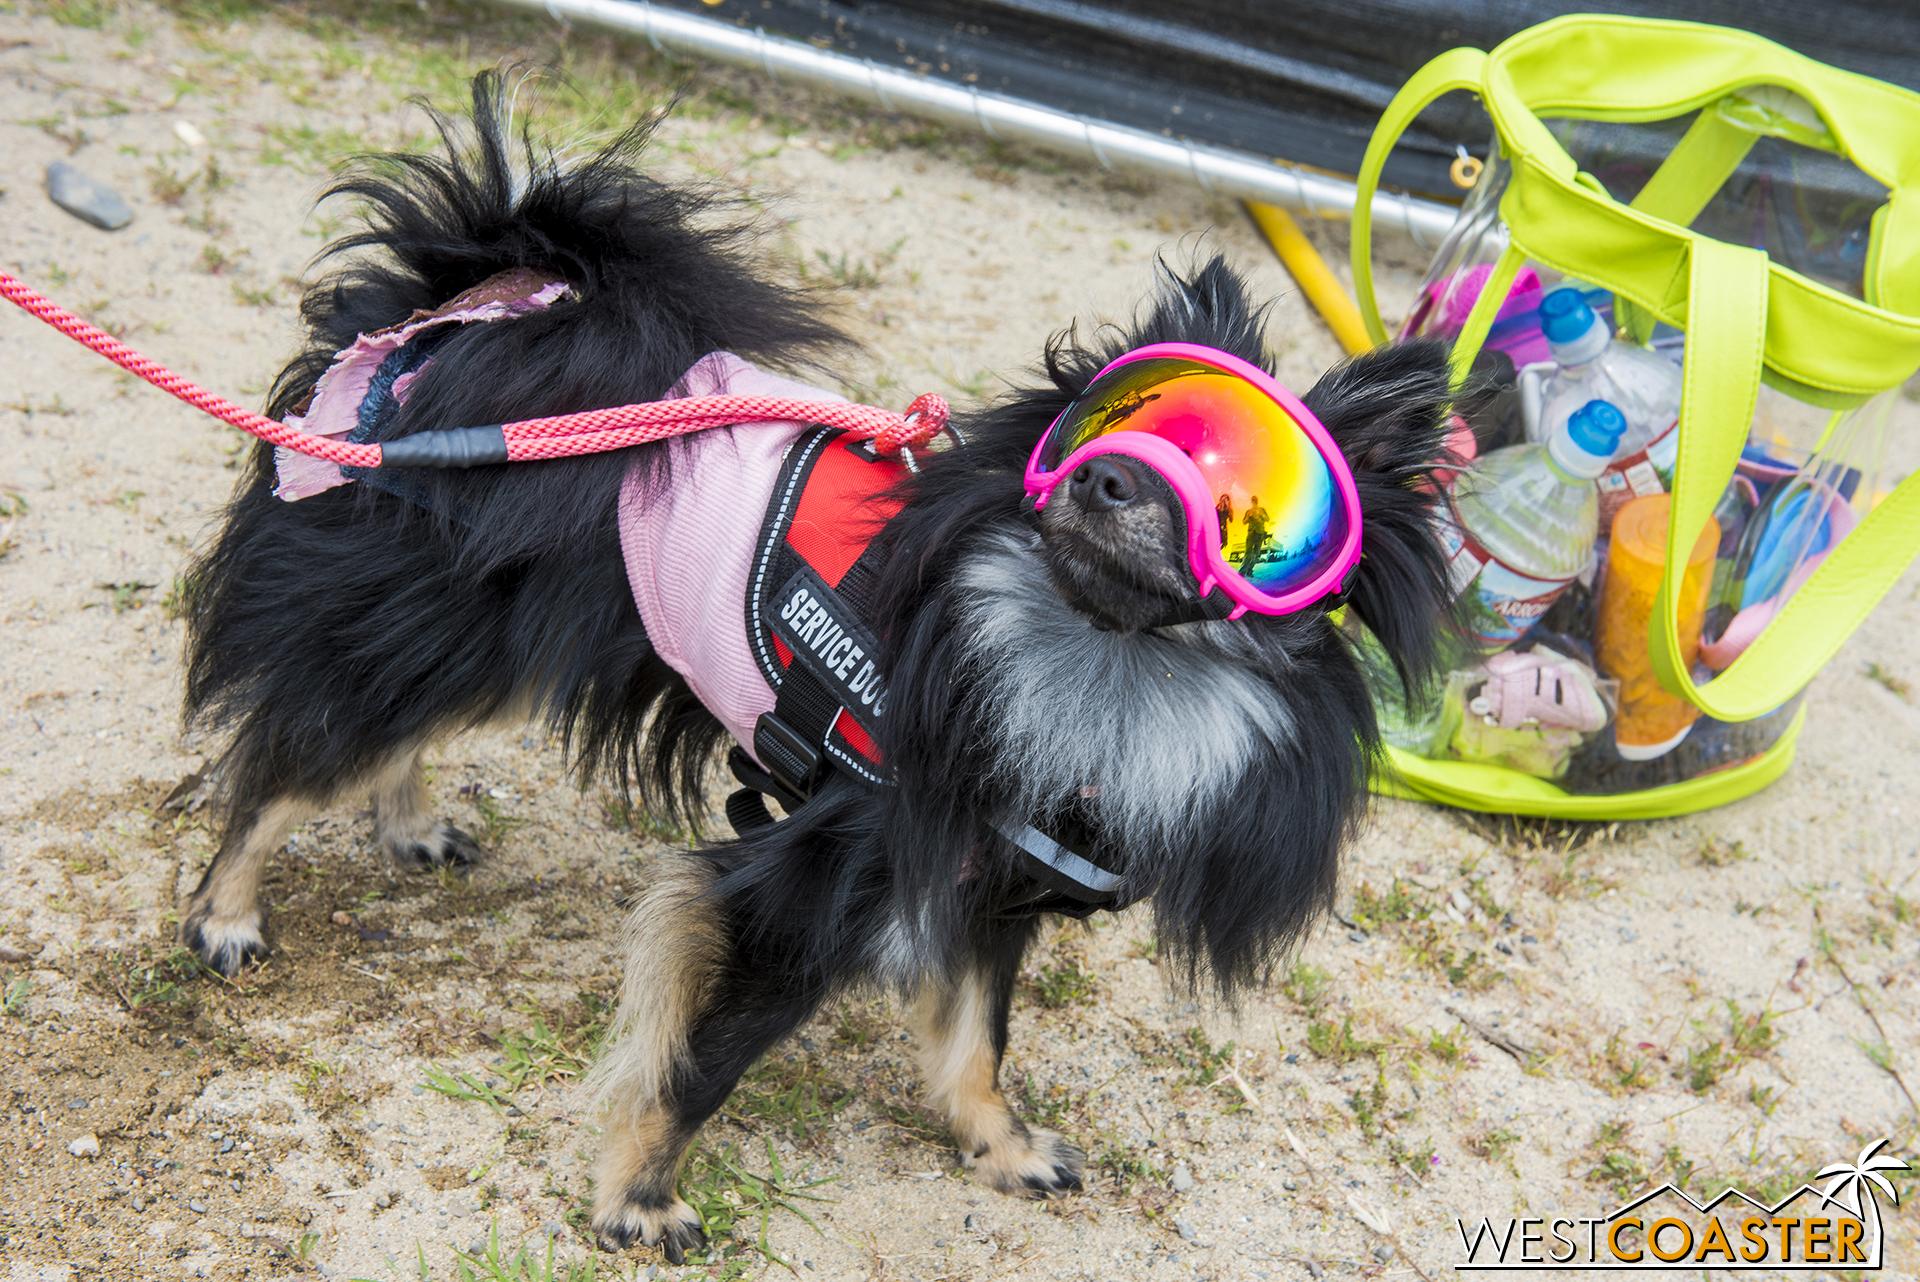 Even furry, four-legged creatures got into some of the celebratory spirit.